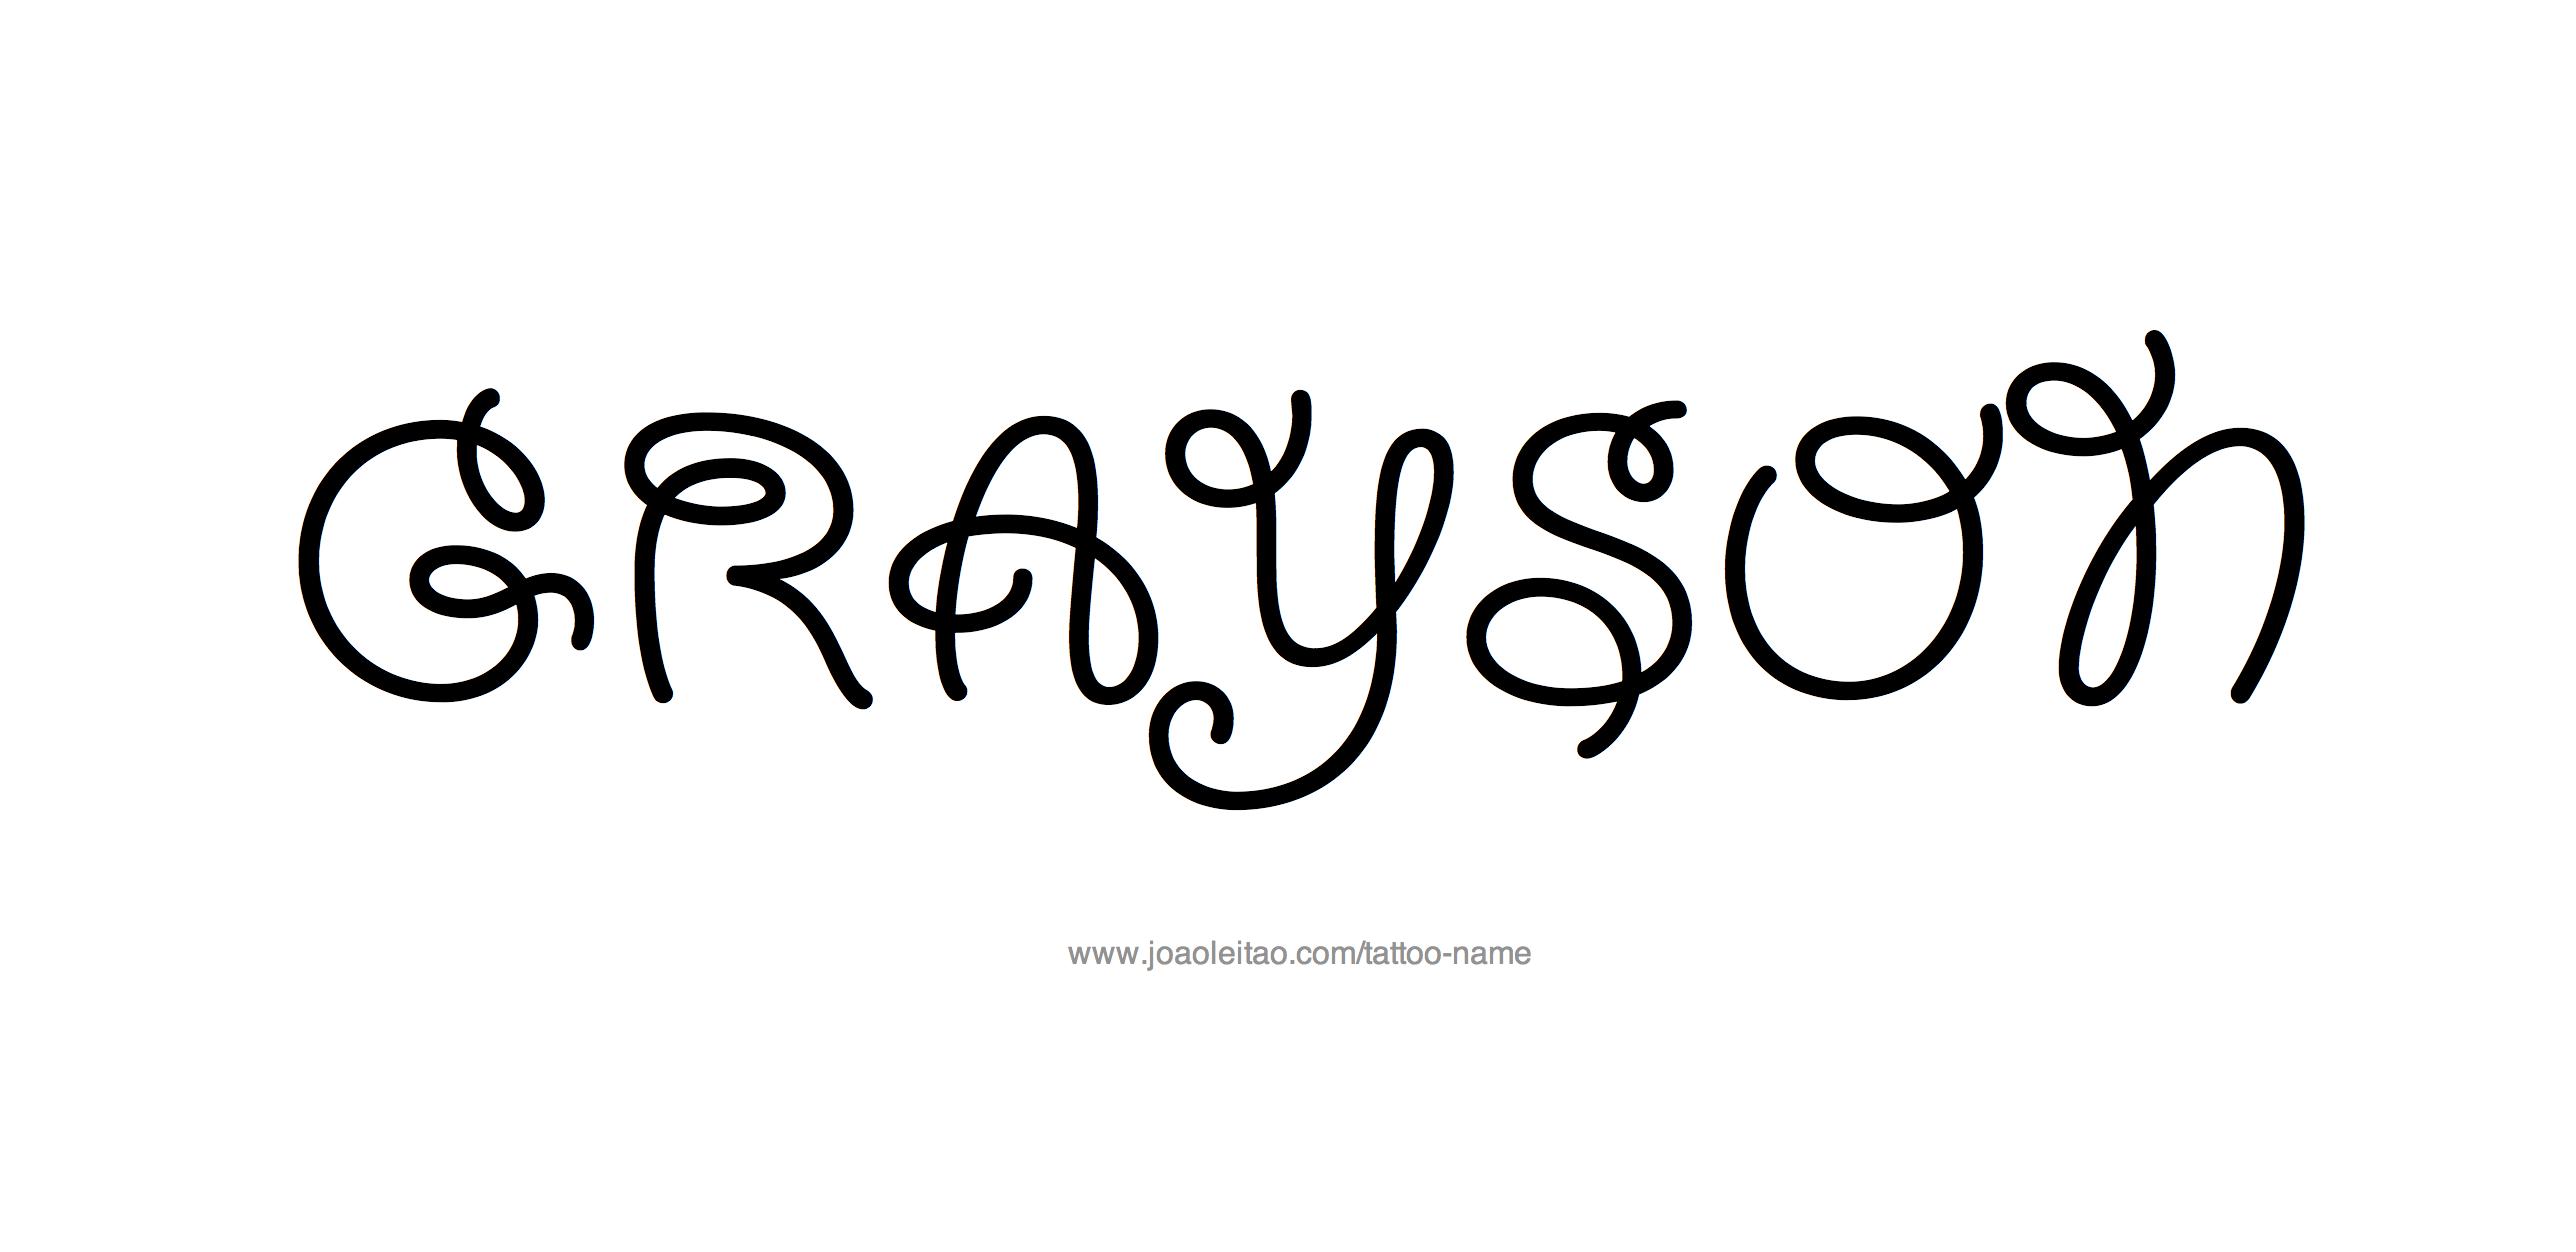 grayson Archives - Free Name Designs  |Grayson Name